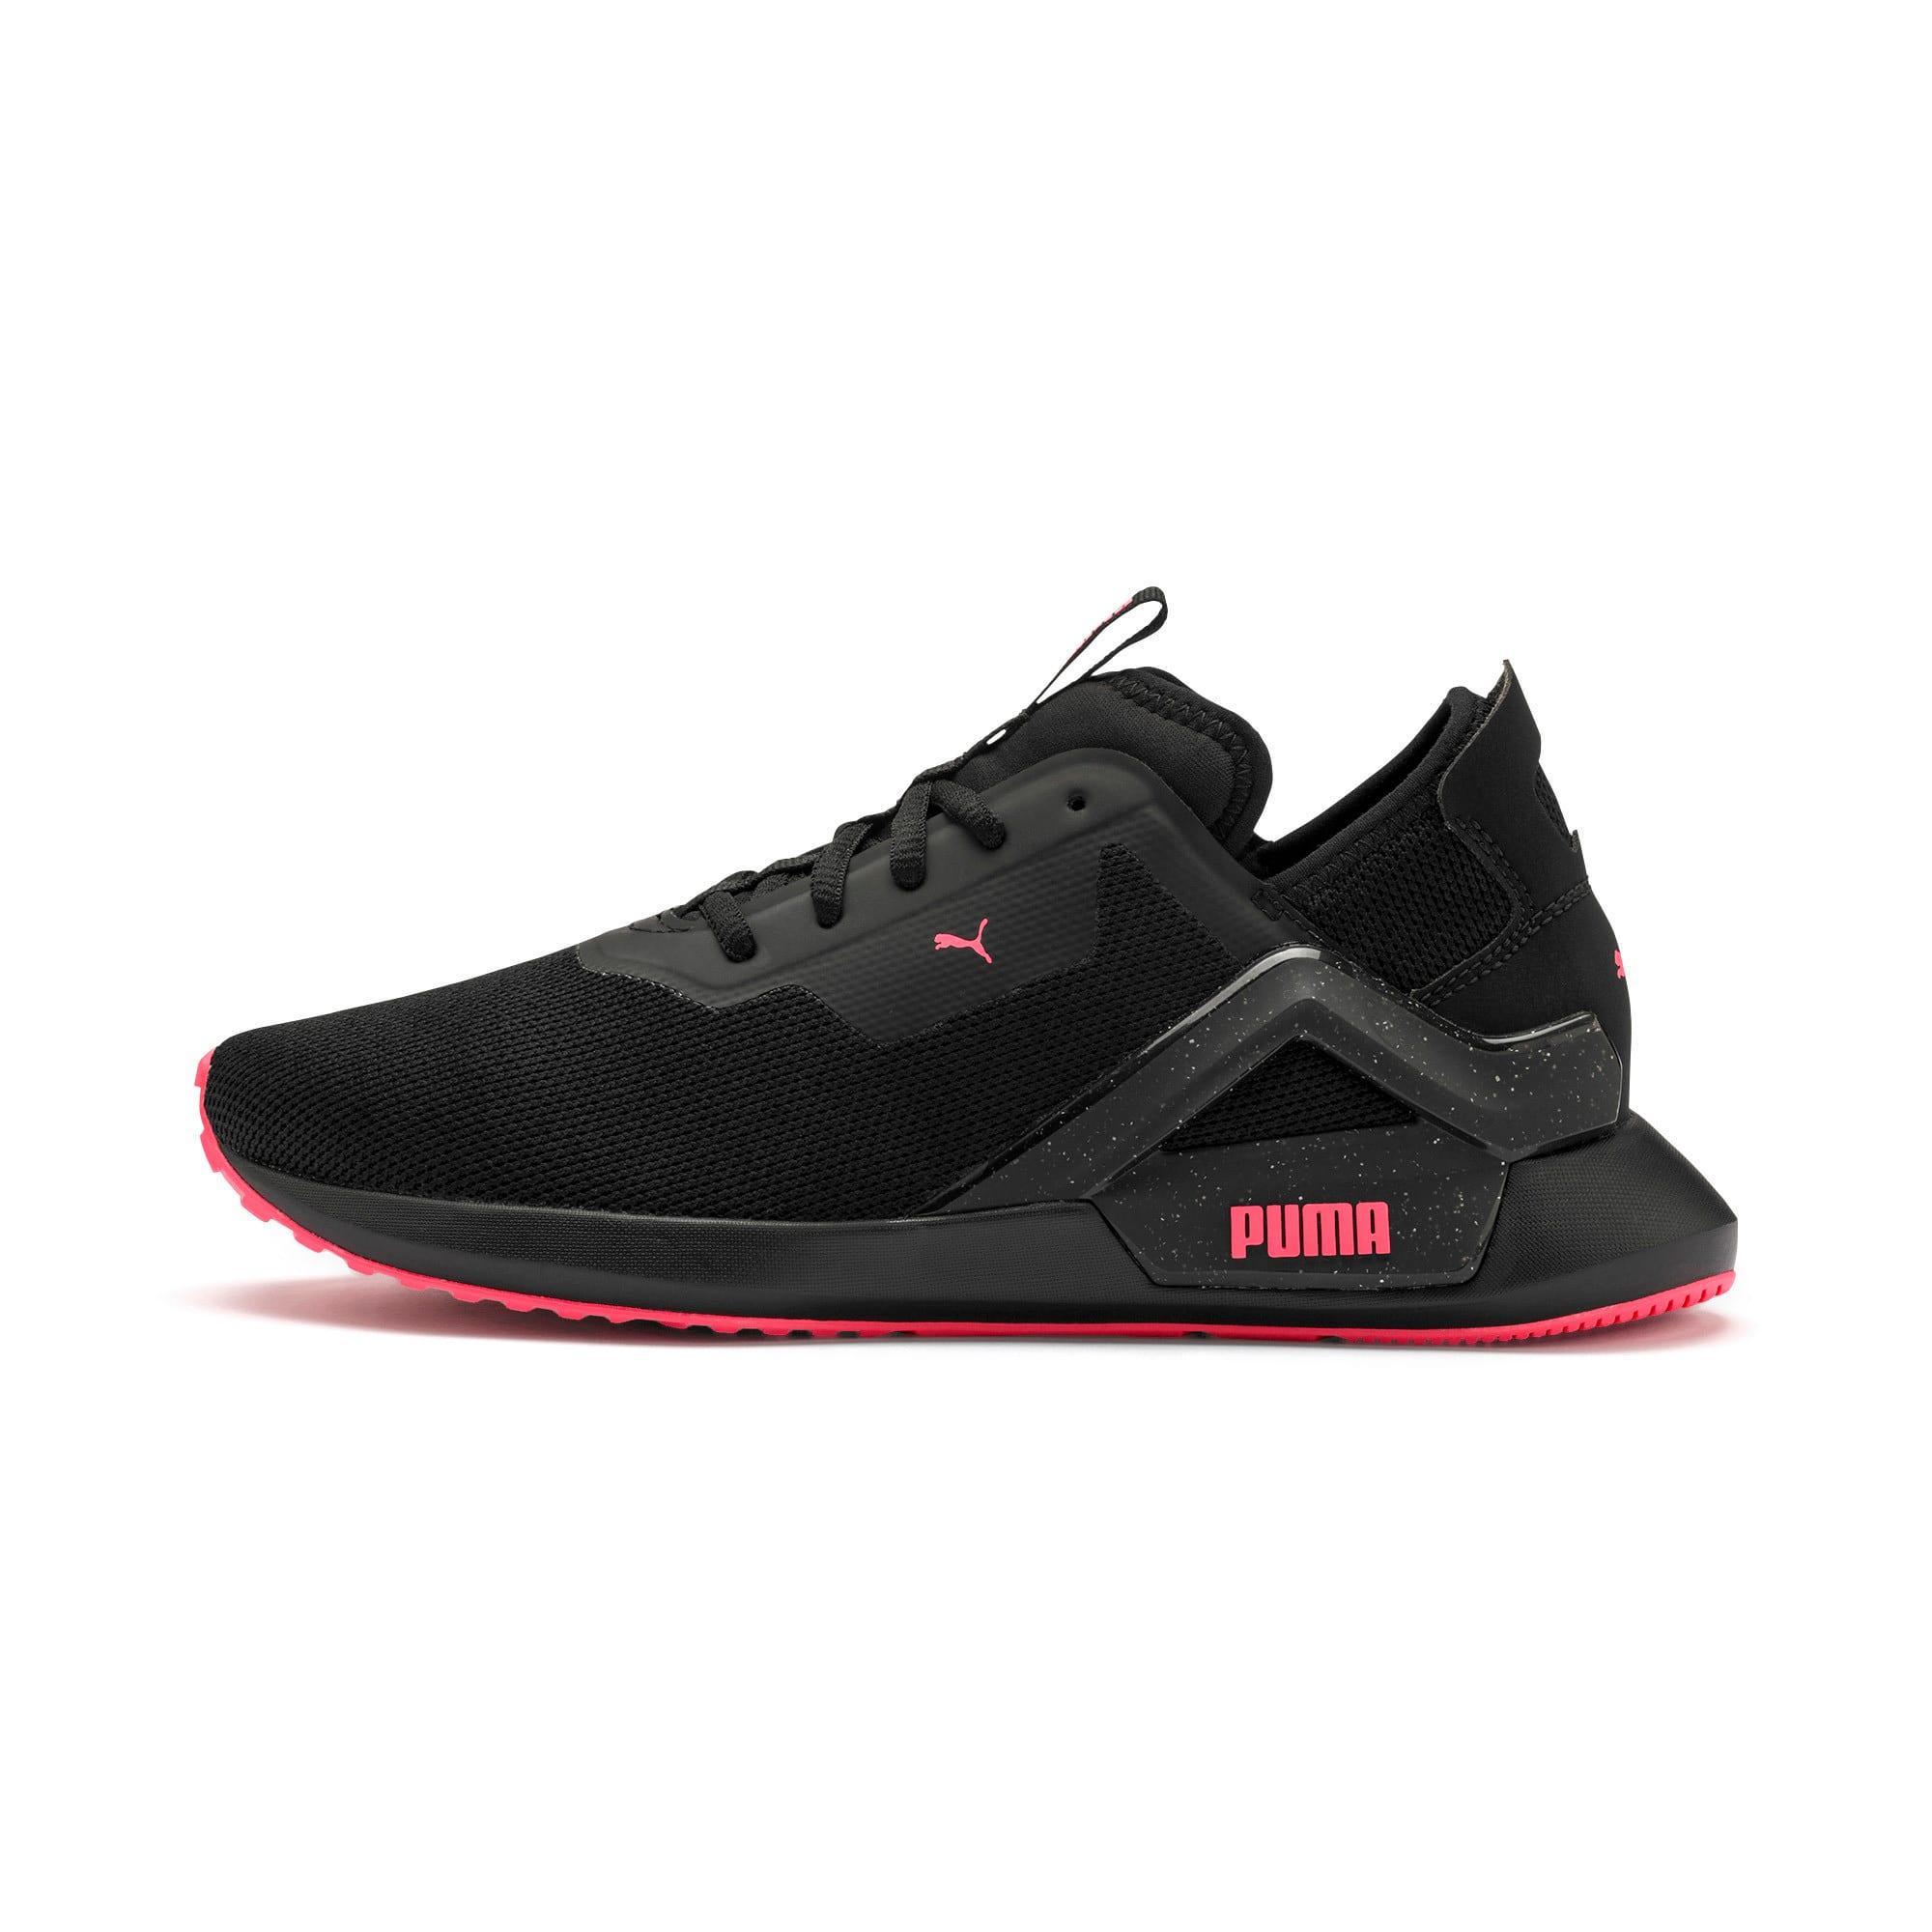 Thumbnail 1 of Rogue X Knit Women's Running Shoes, Puma Black-Pink Alert, medium-IND